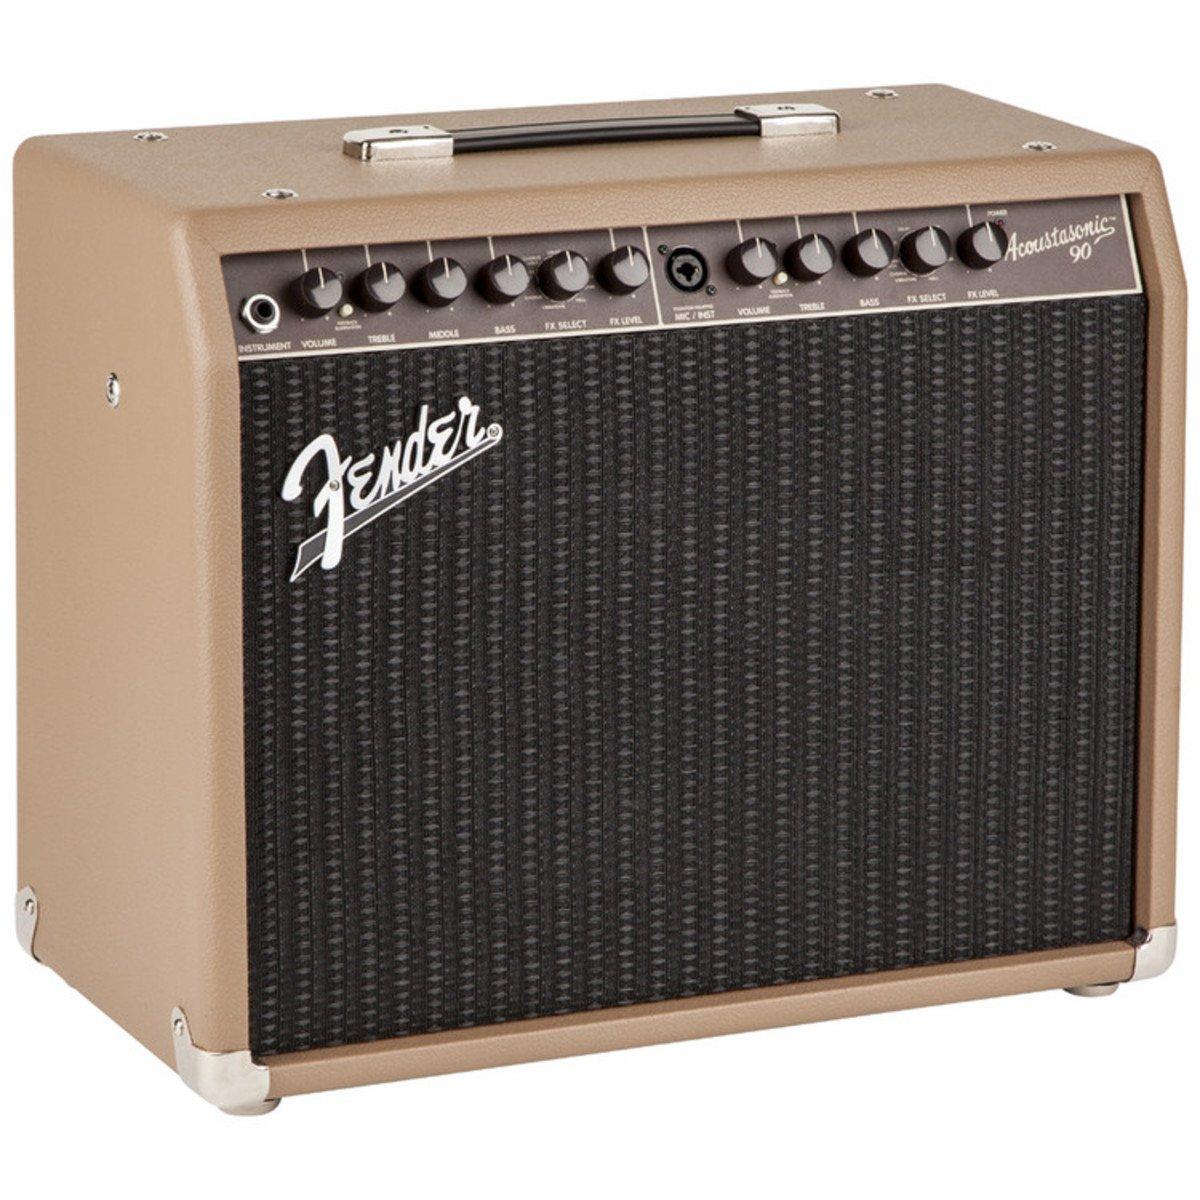 Acoustisonic 90  Amplifier